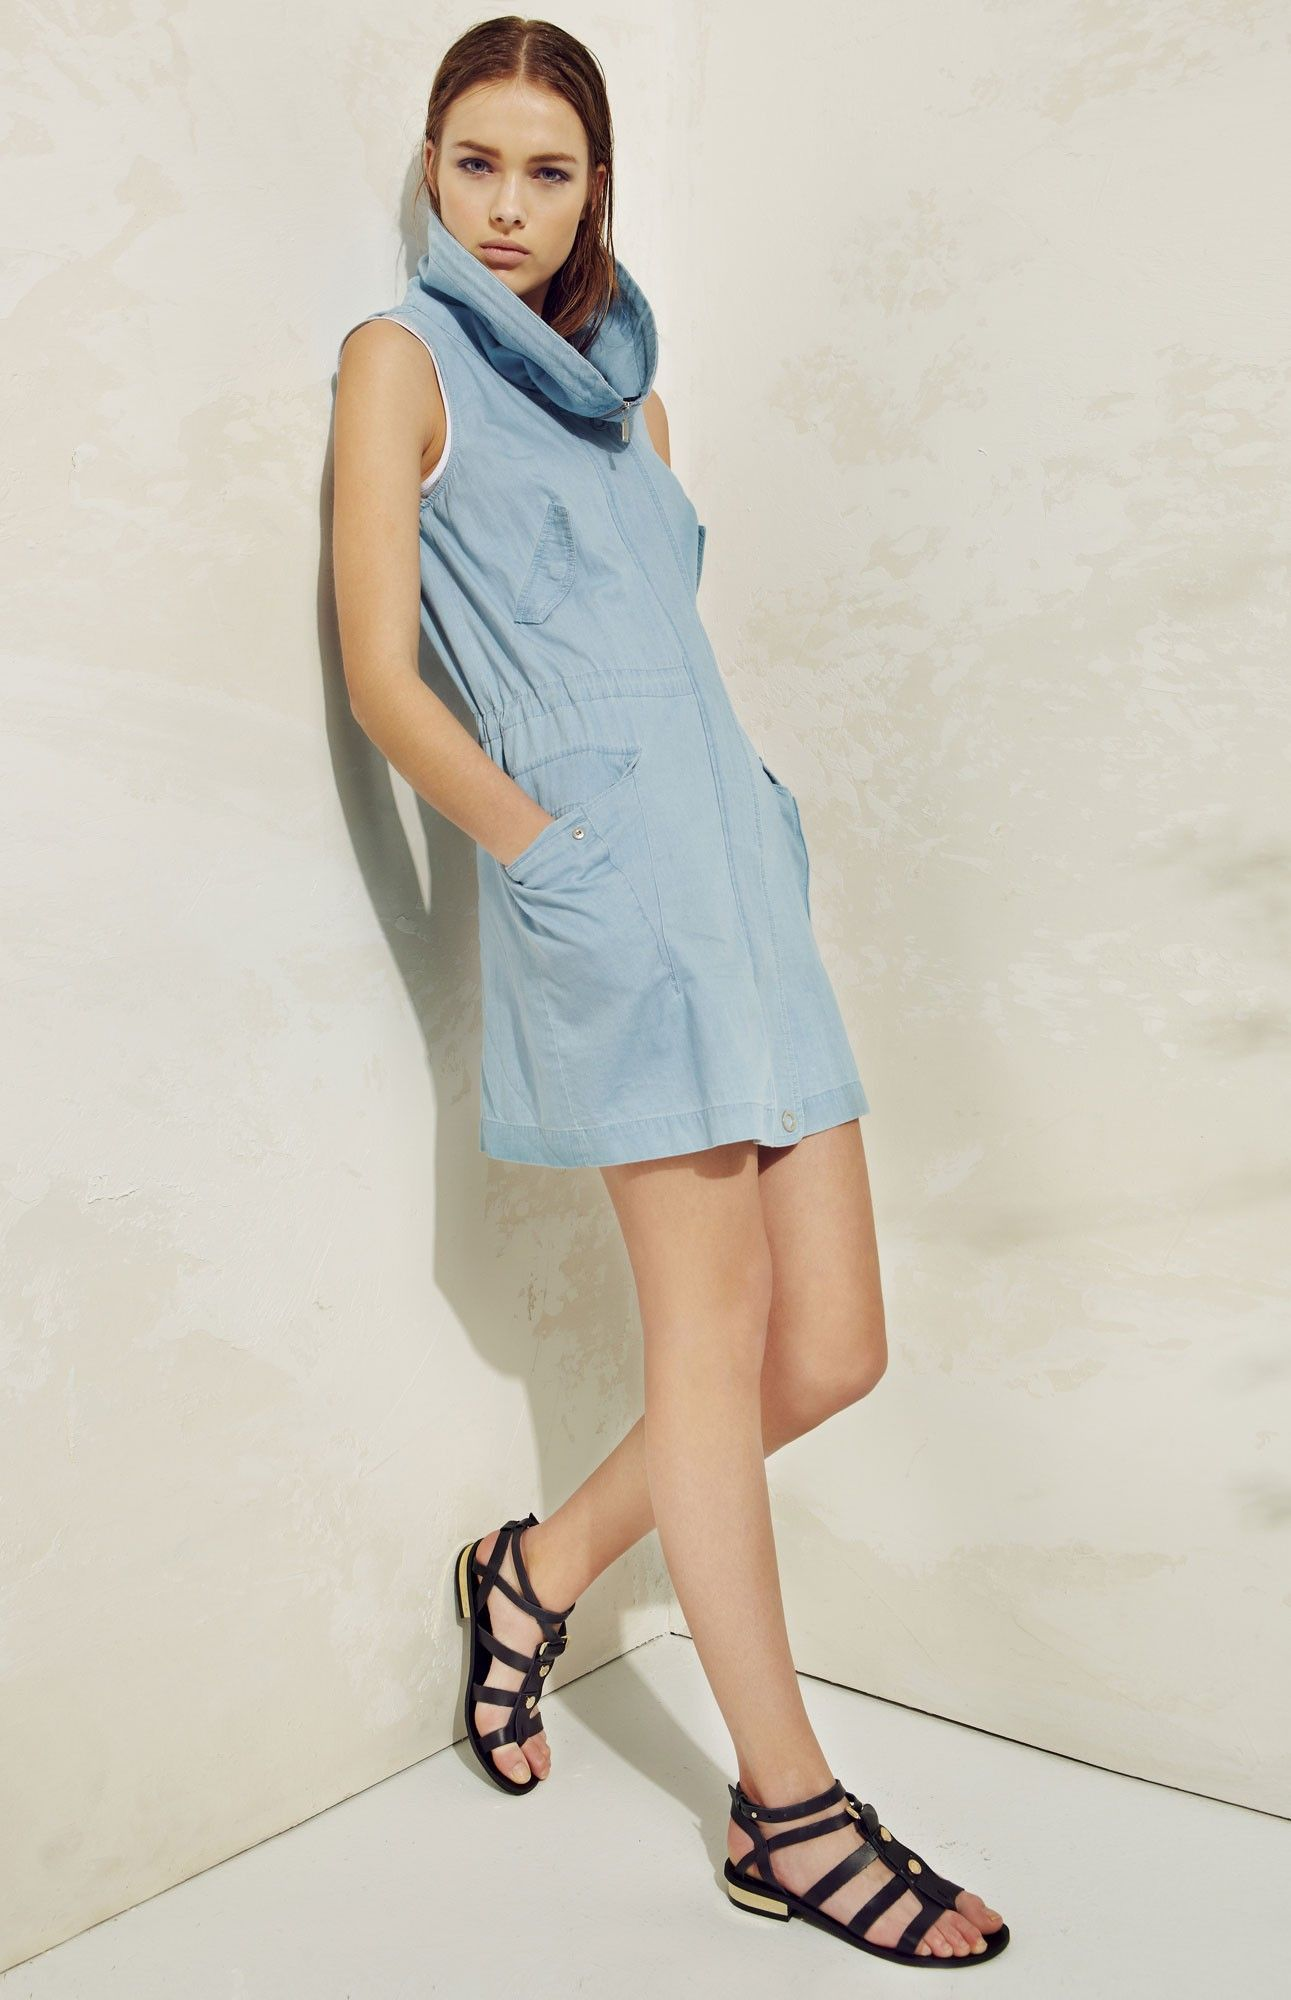 Vestido denim - vestidos - U CHICA